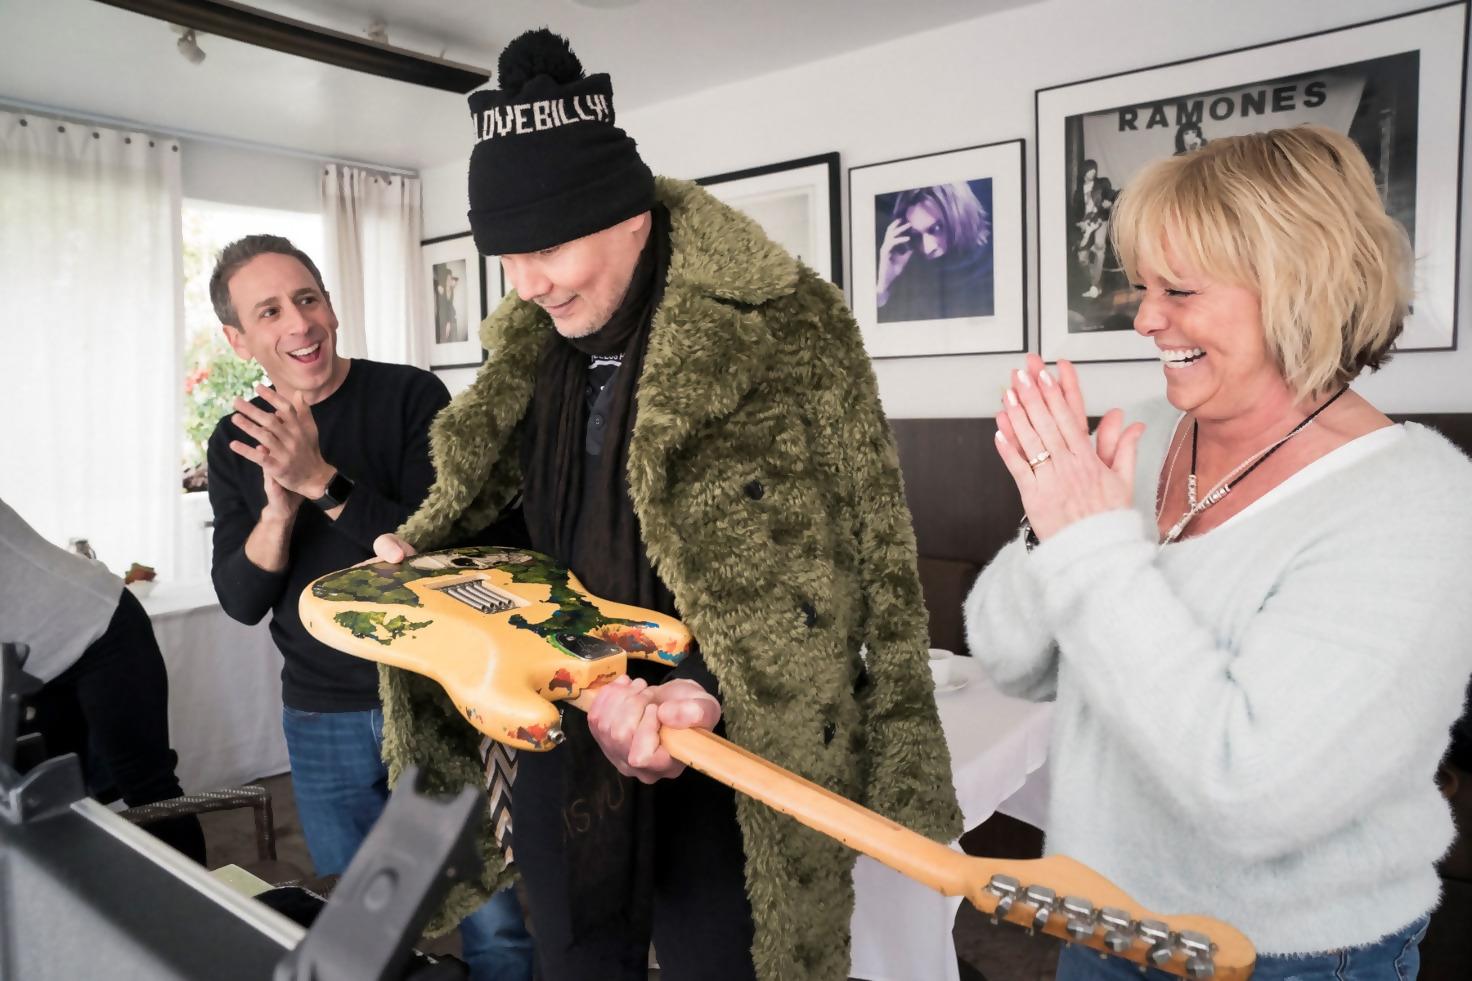 Billy Corgan Reunited With Stolen 'Gish' Guitar